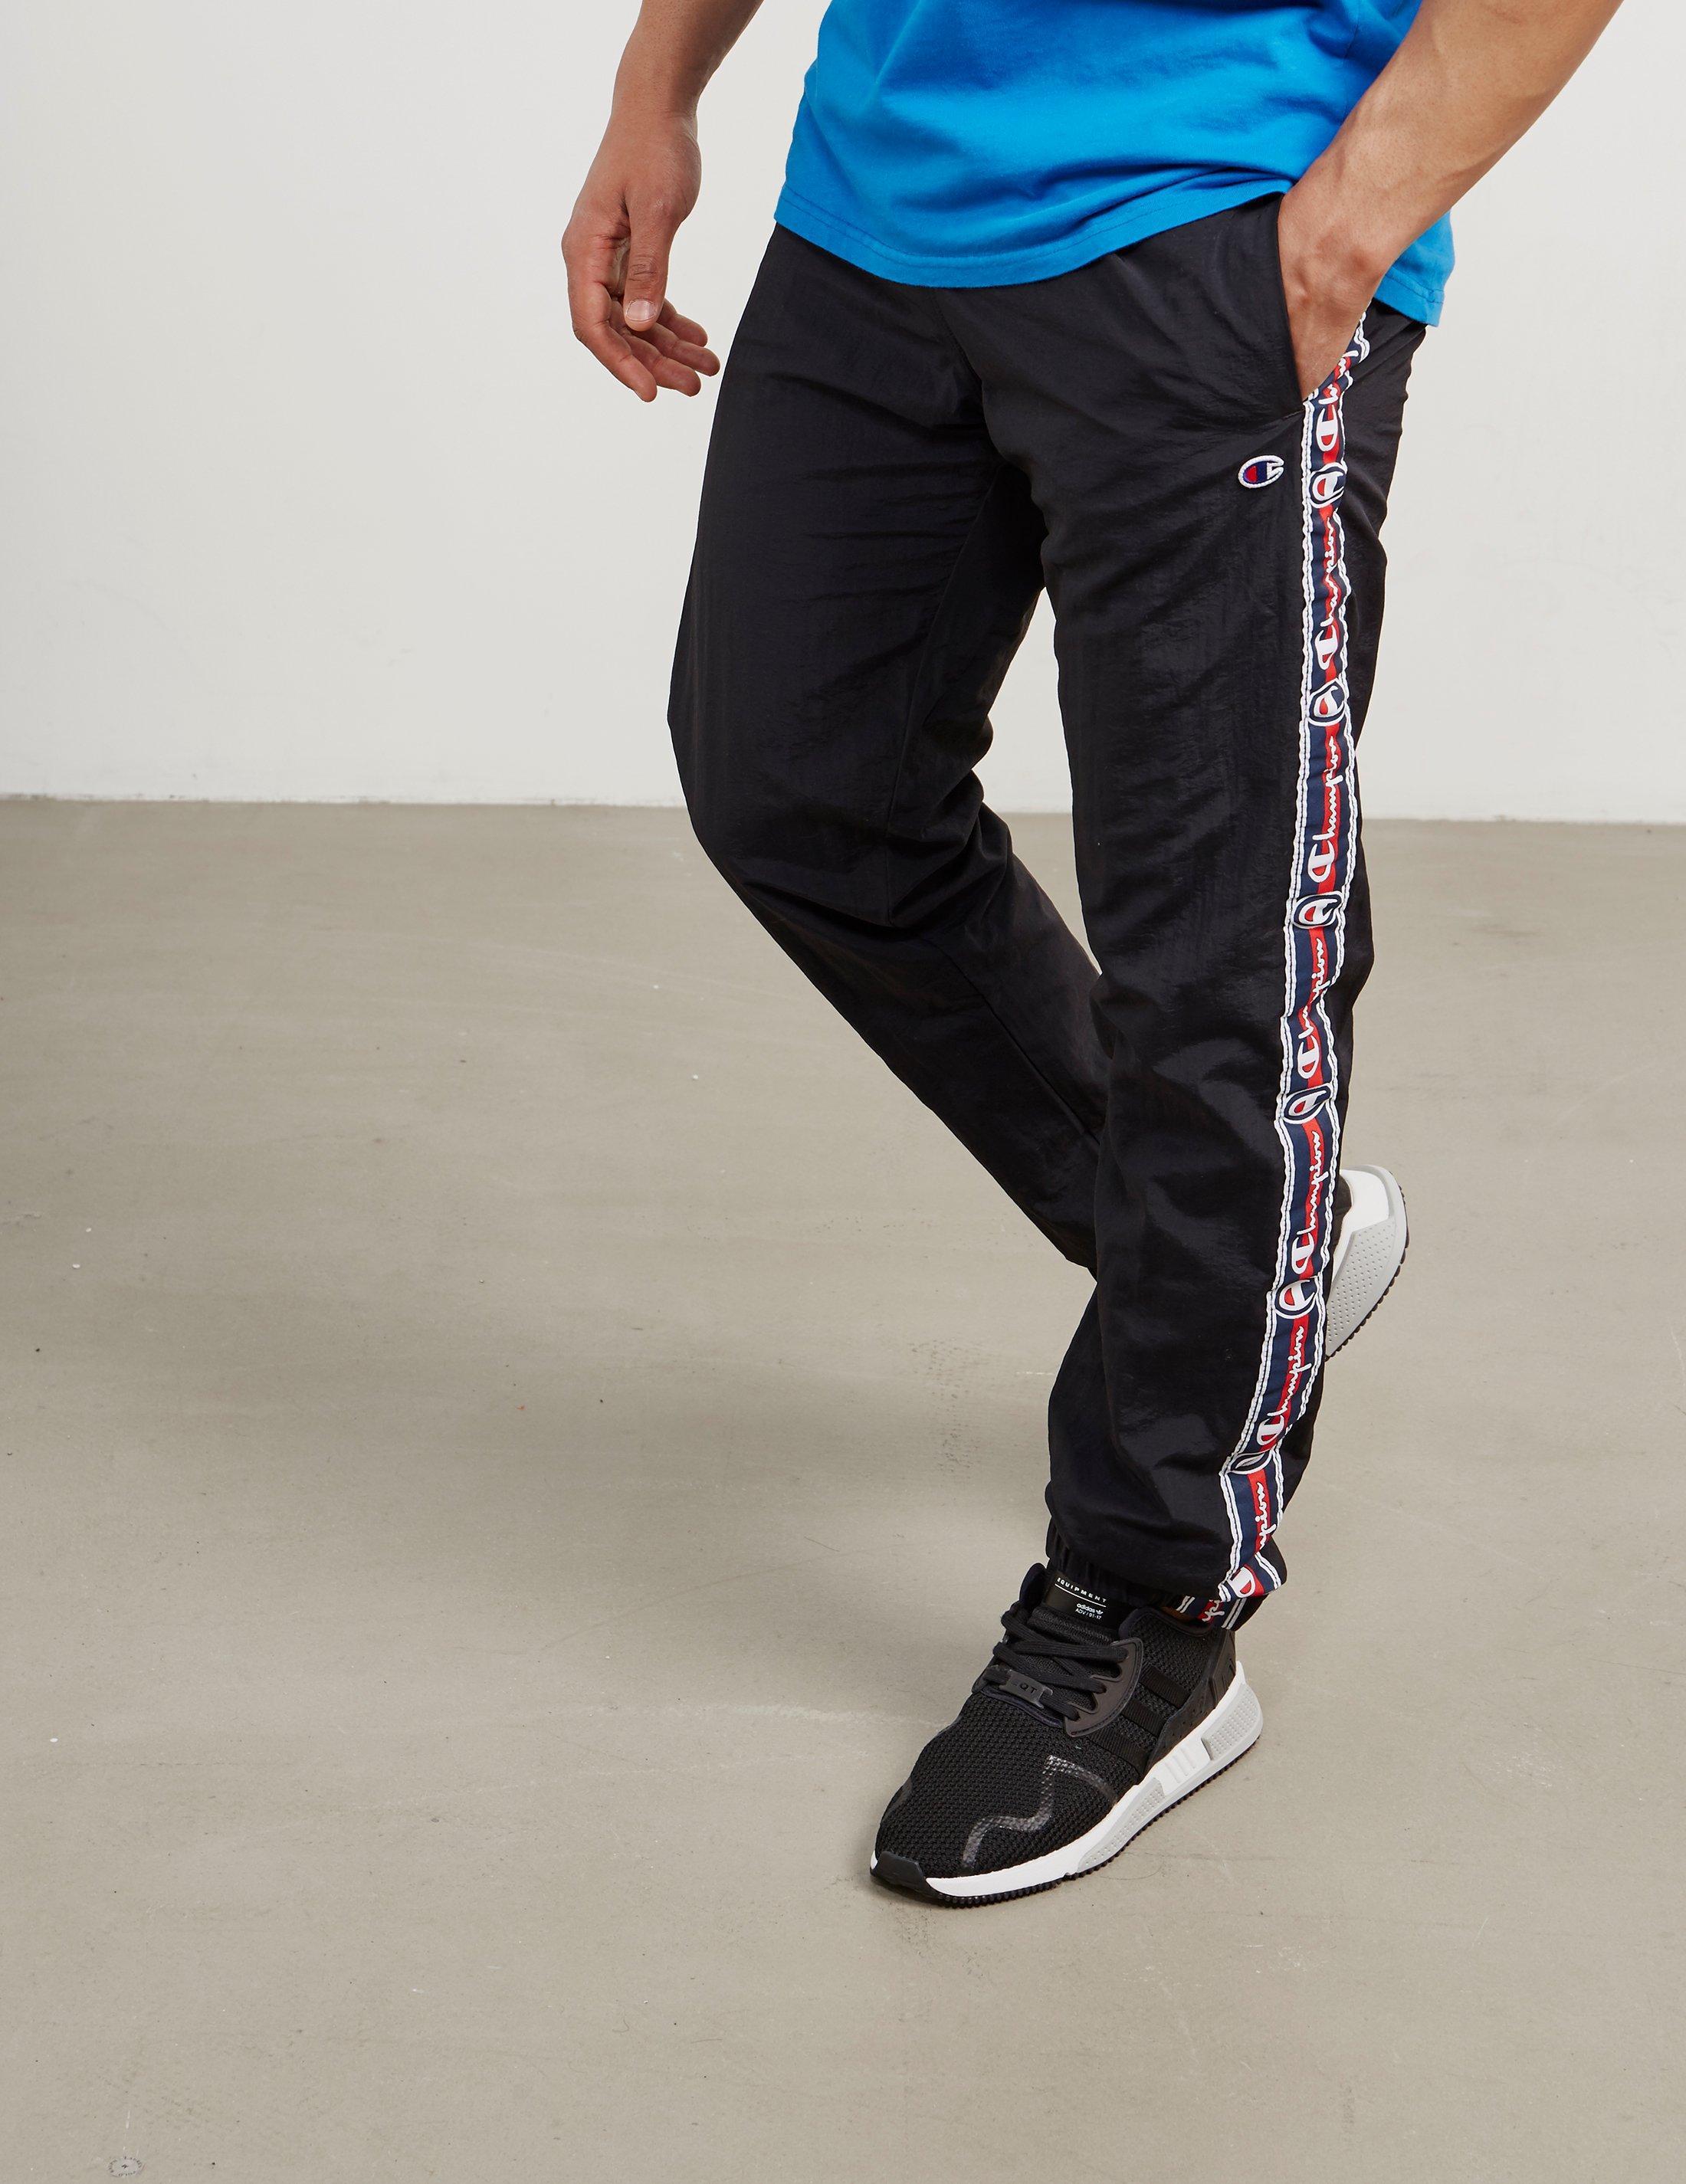 f19d95c4747b Champion Mens Retro Tape Track Pants Black in Black for Men - Lyst